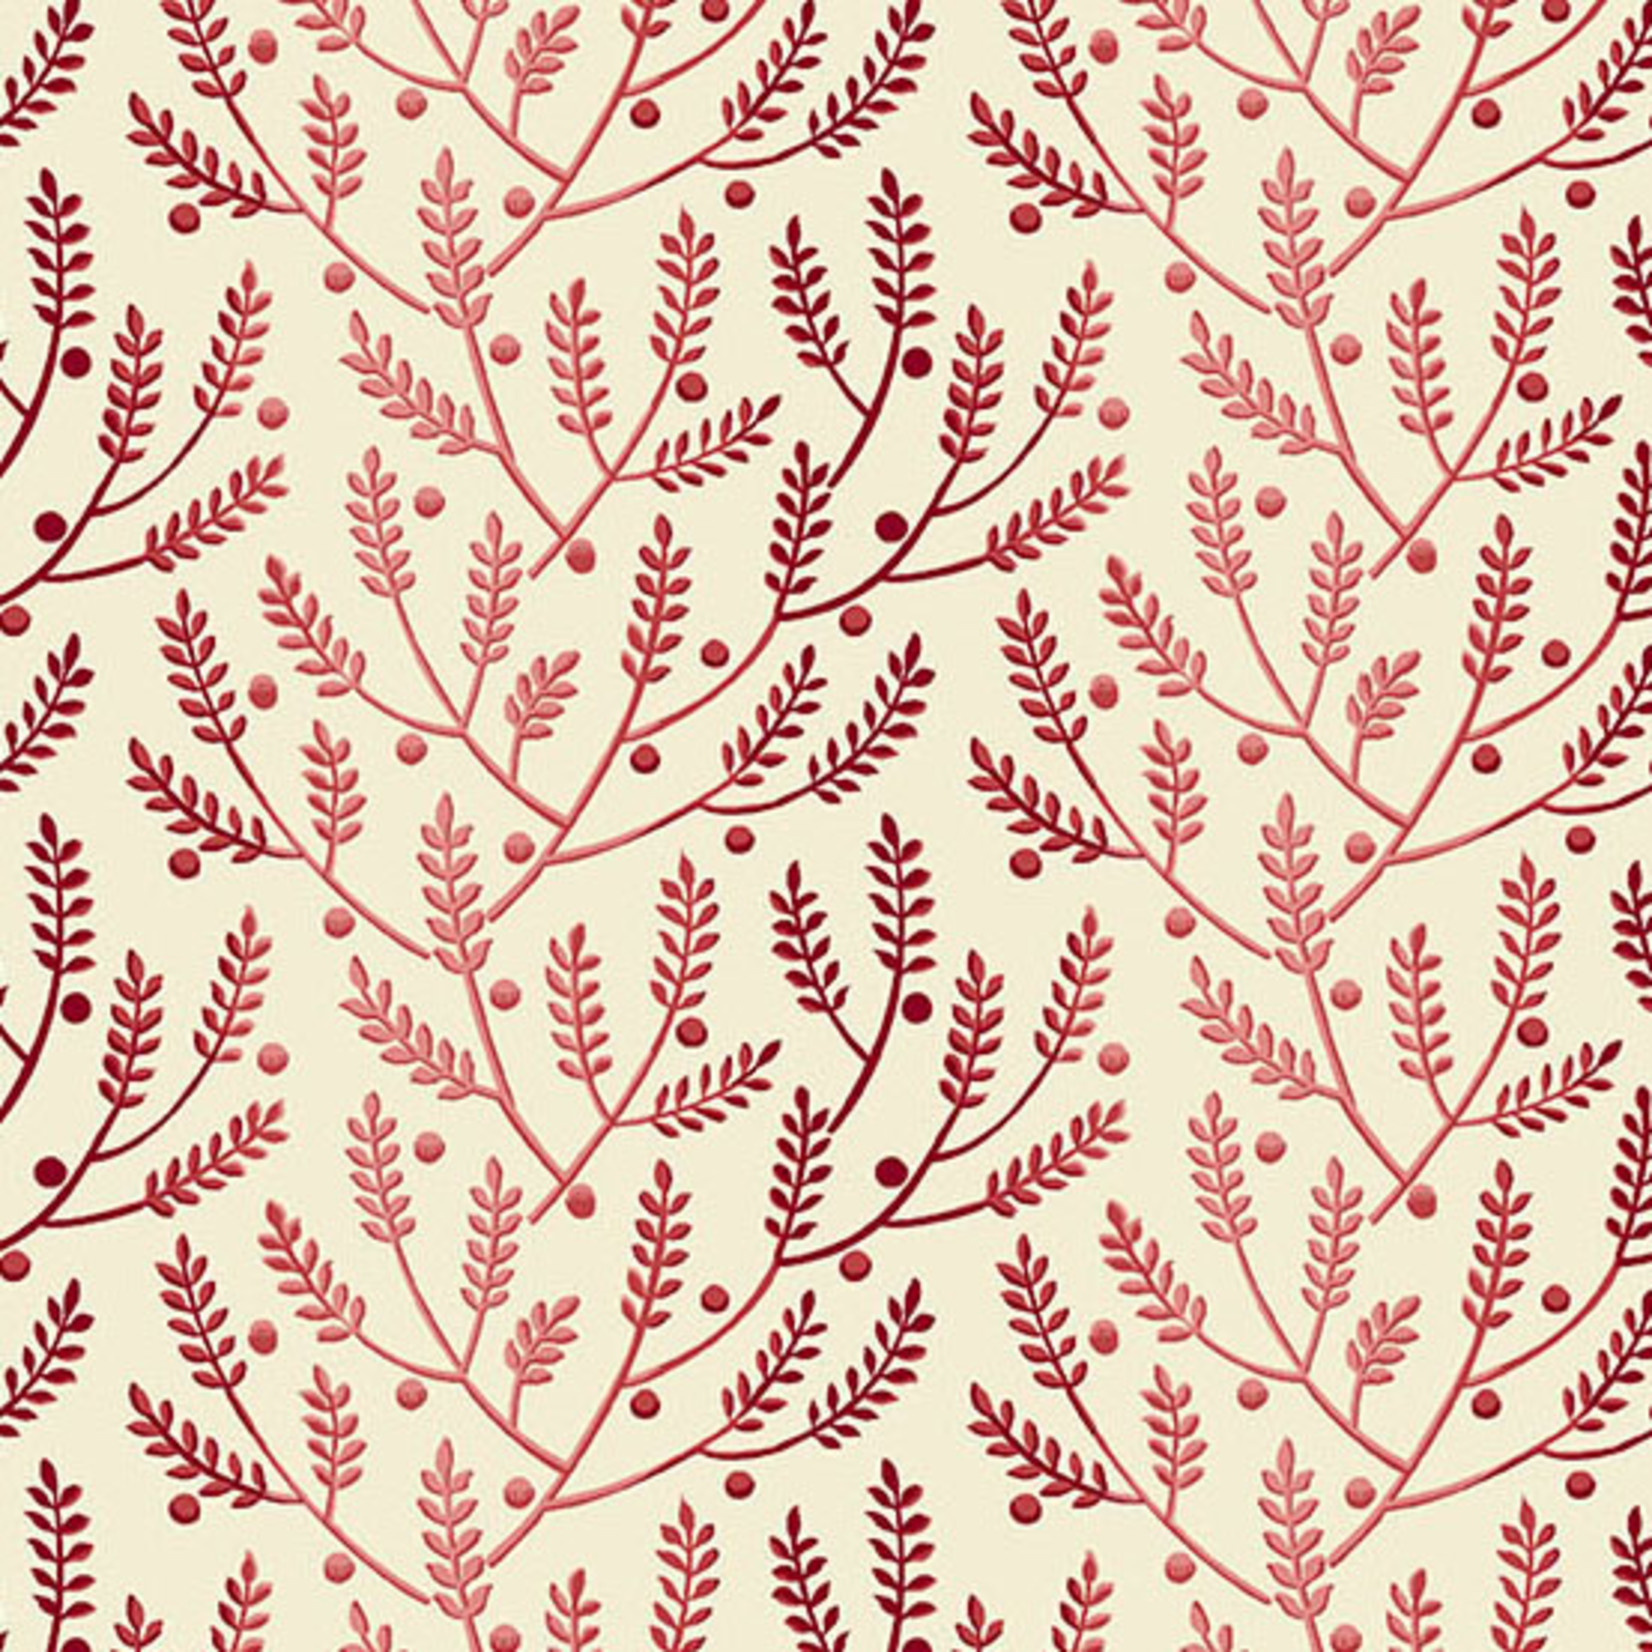 Edyta Sitar Secret Stash - Warms, Lavender, Pink (8823-E) $0.20 per cm or $20/m